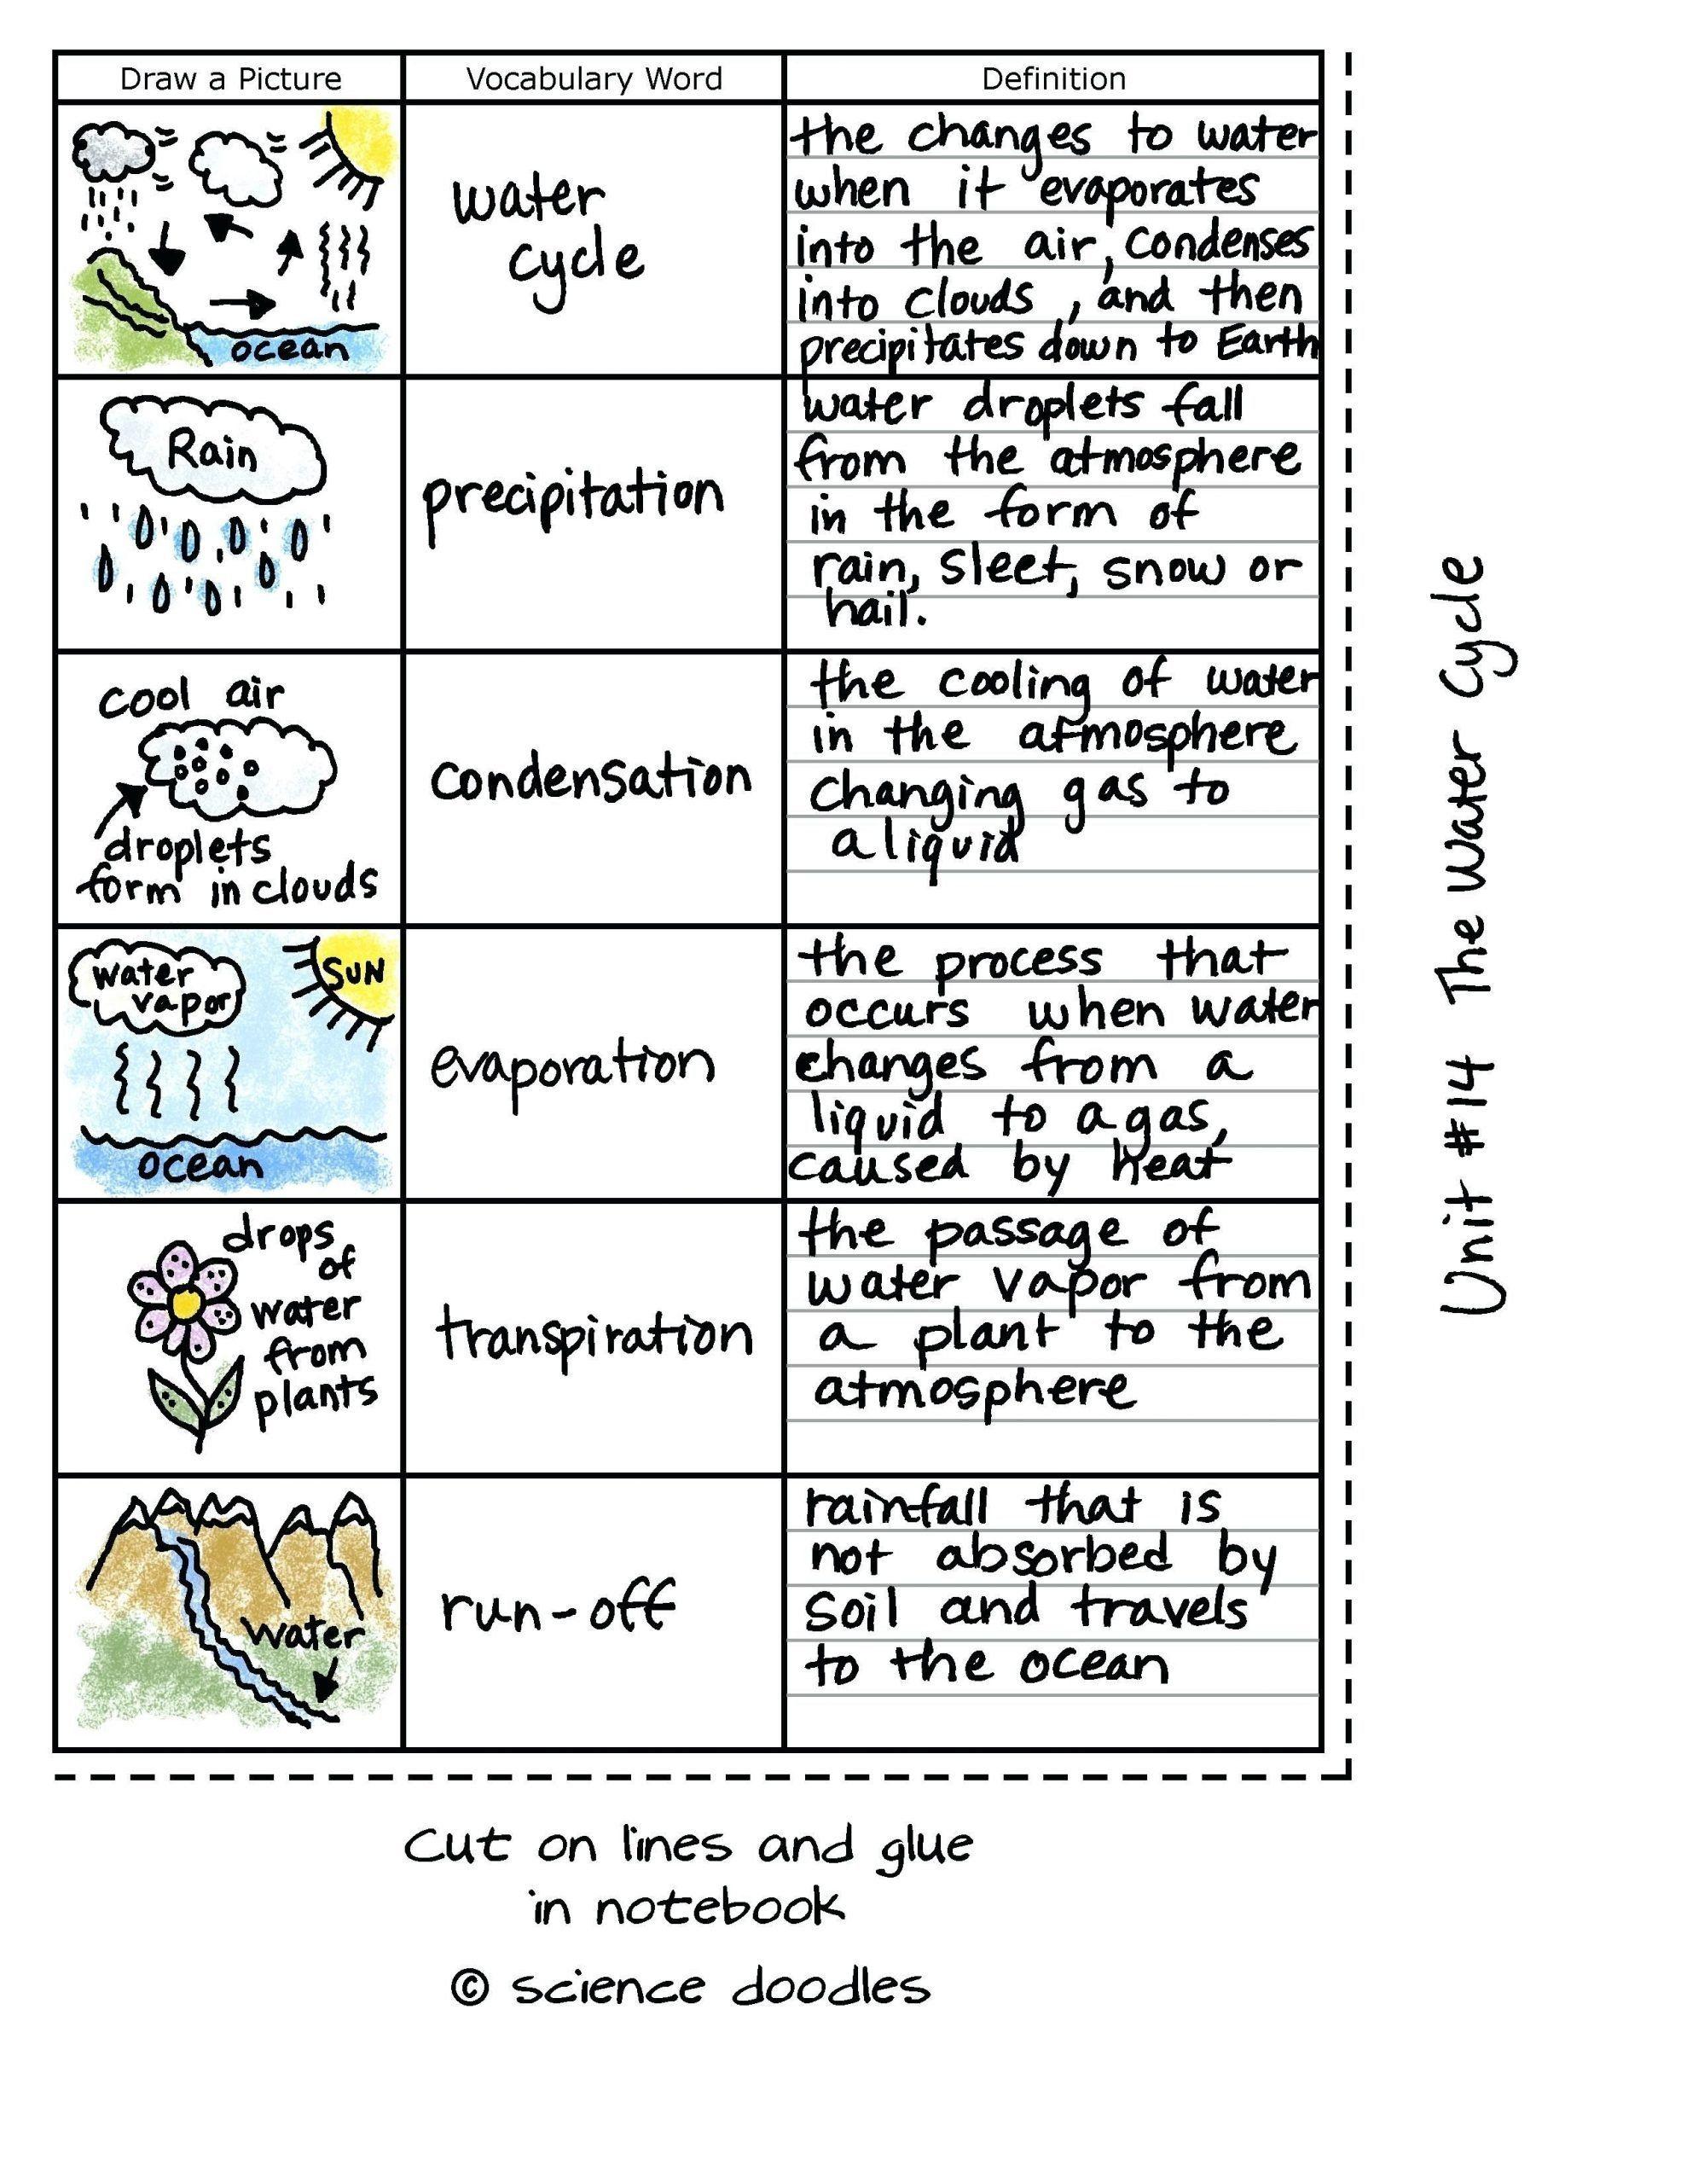 Water Cycle Worksheets 5th Grade 36 Simple Water Cycle Worksheet Ideas S Bacamajalah In 2020 Water Cycle Water Cycle Worksheet Water Cycle Activities